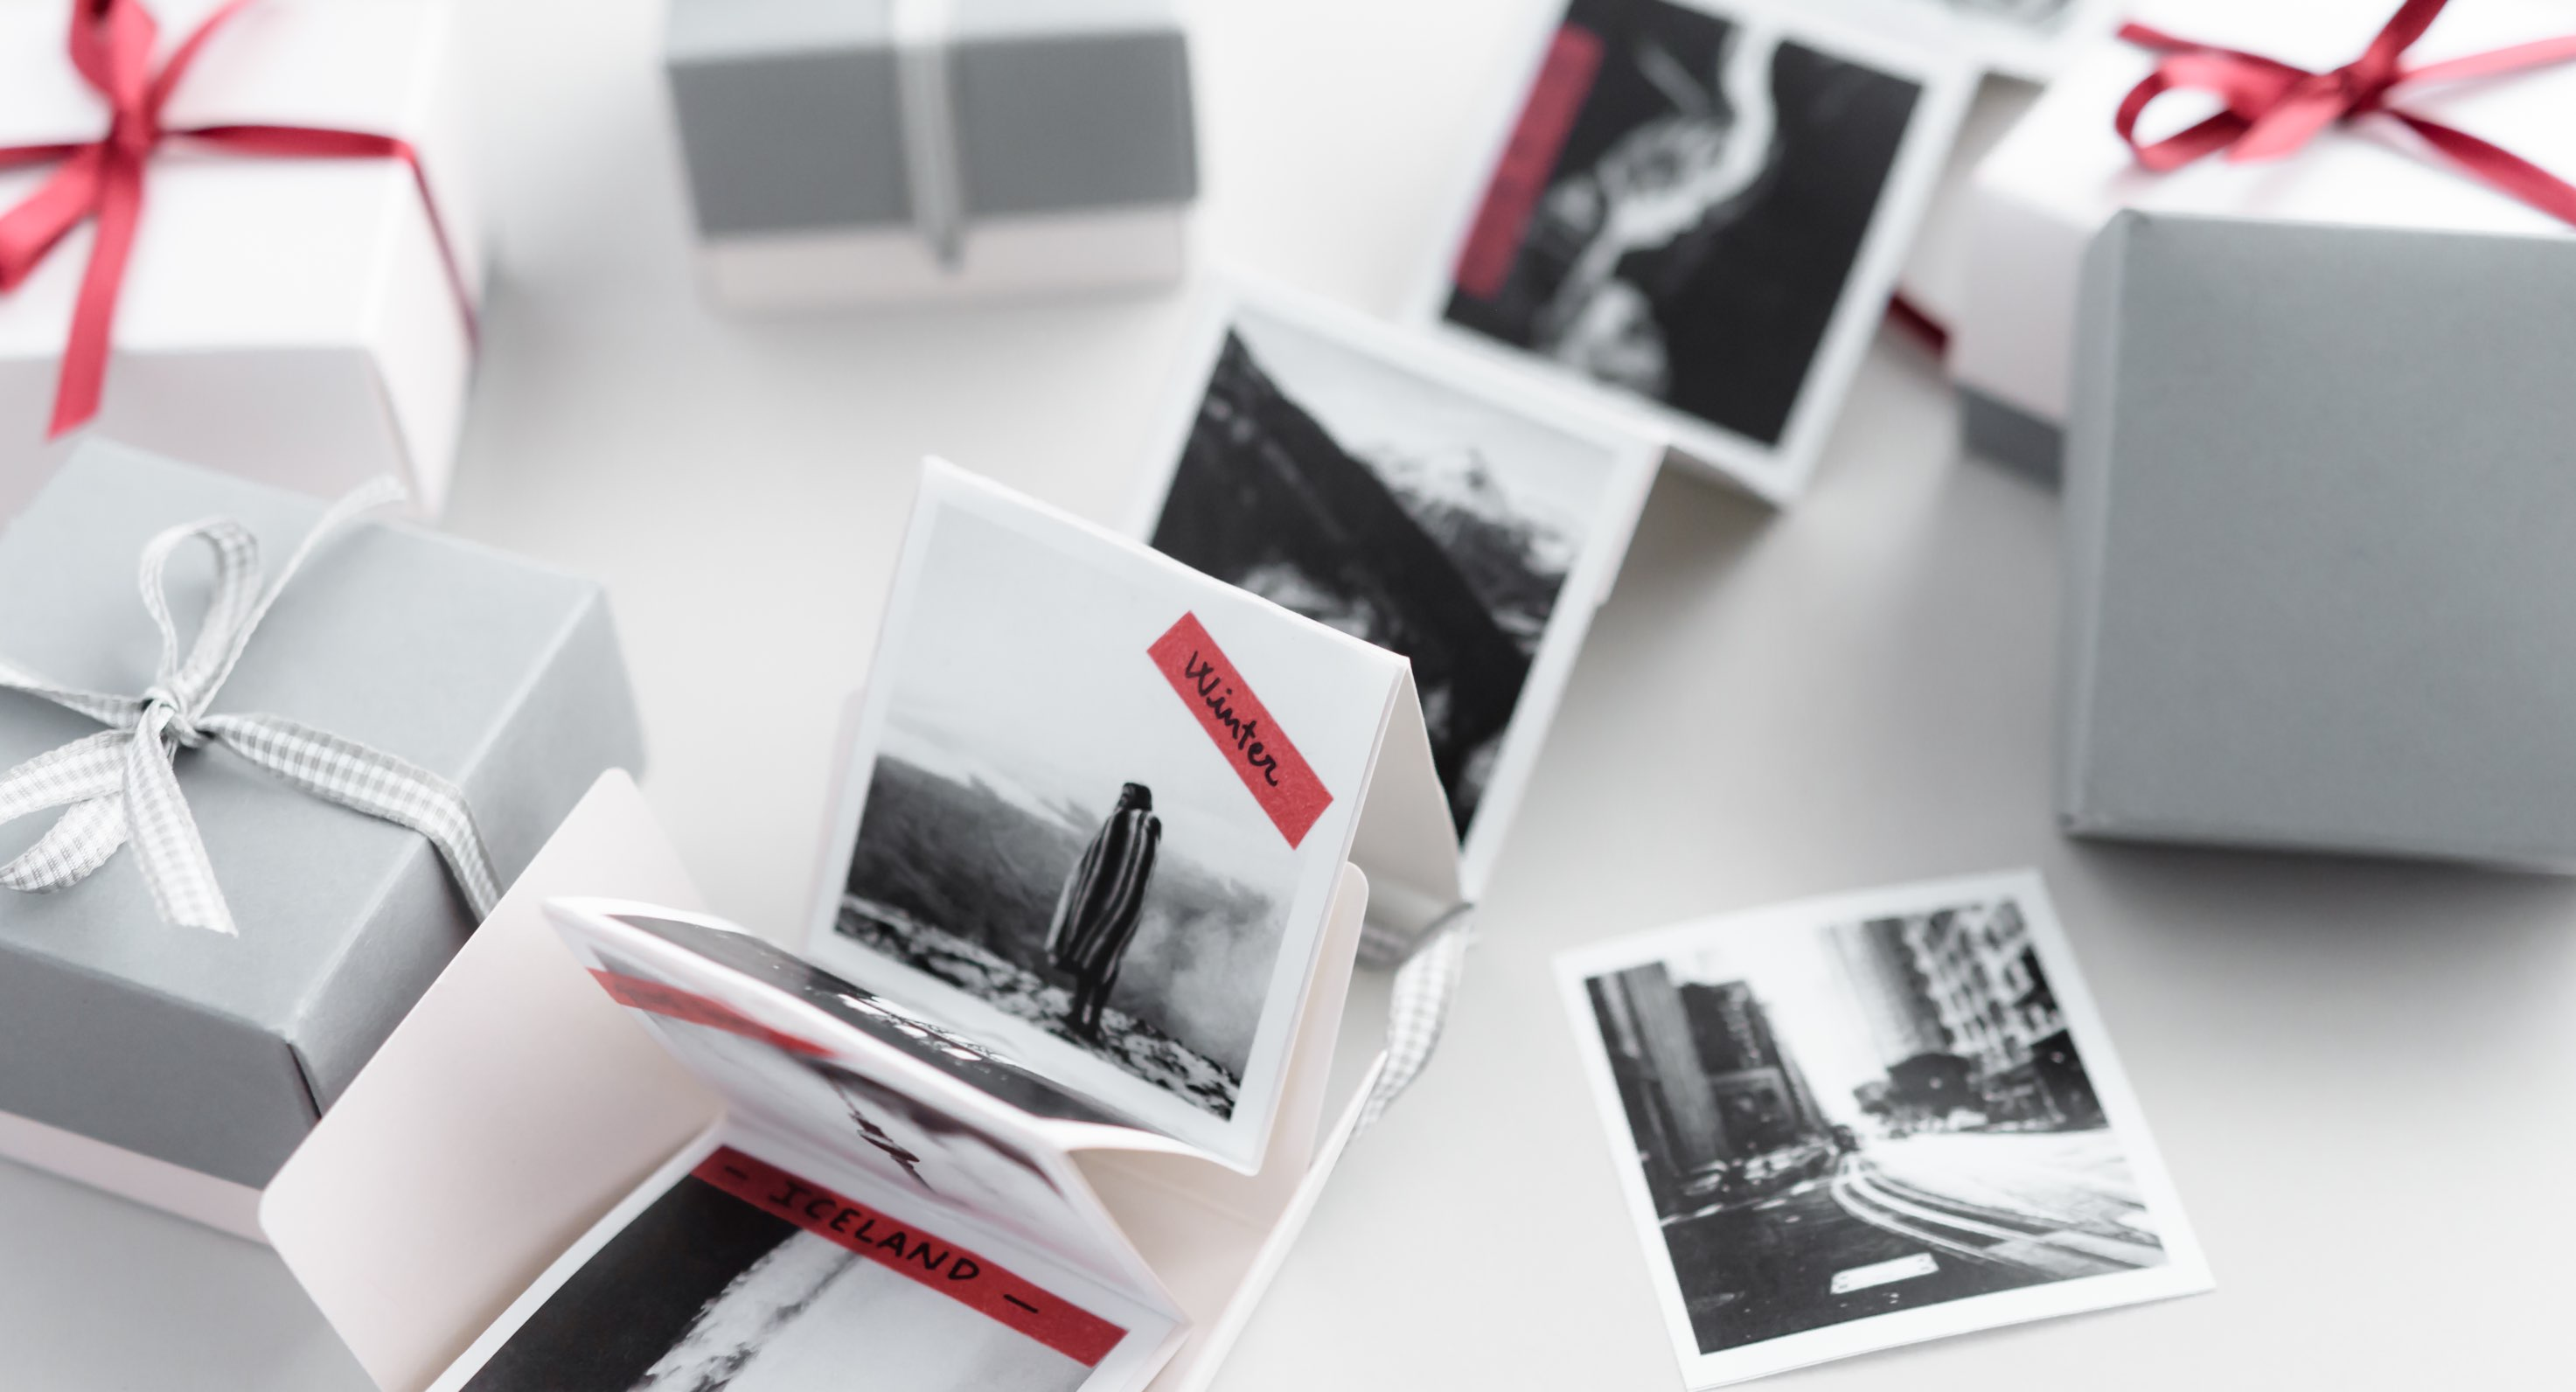 Caja con fotos acordeón